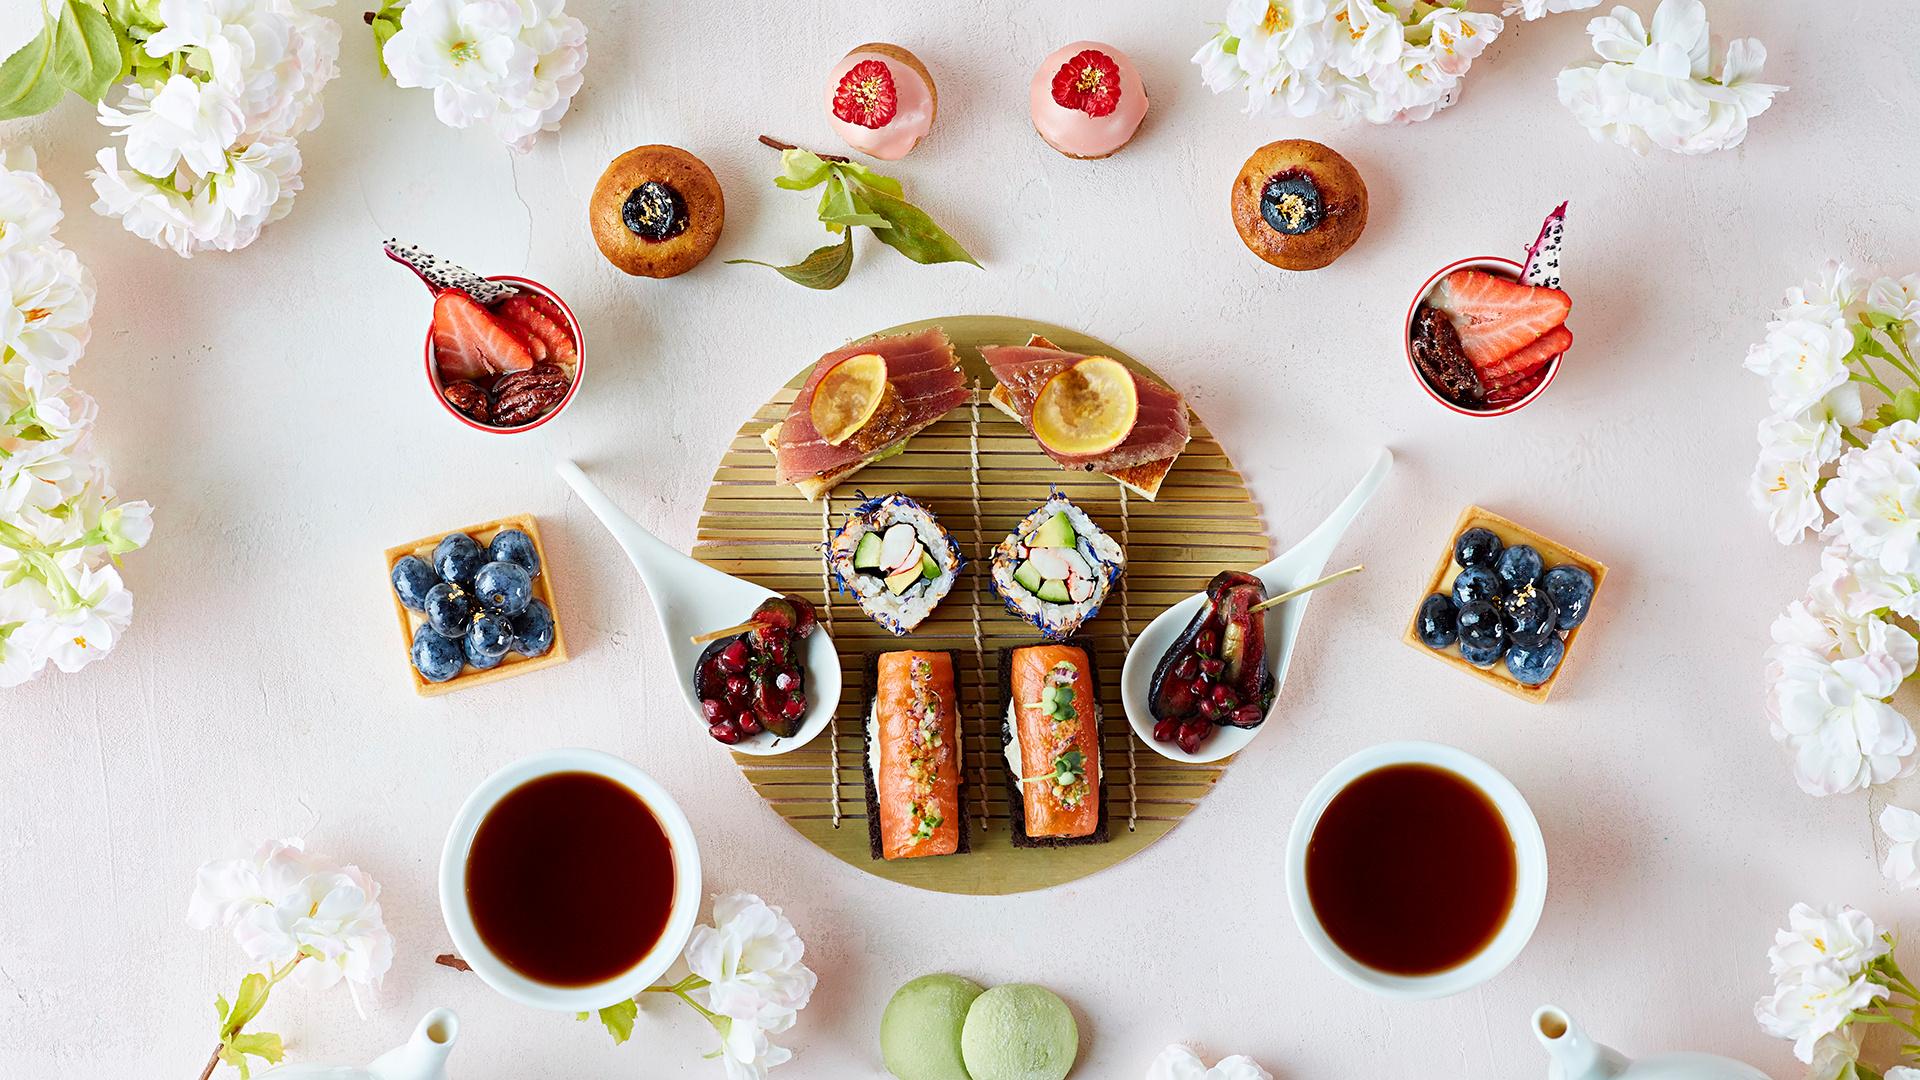 Hana afternoon tea